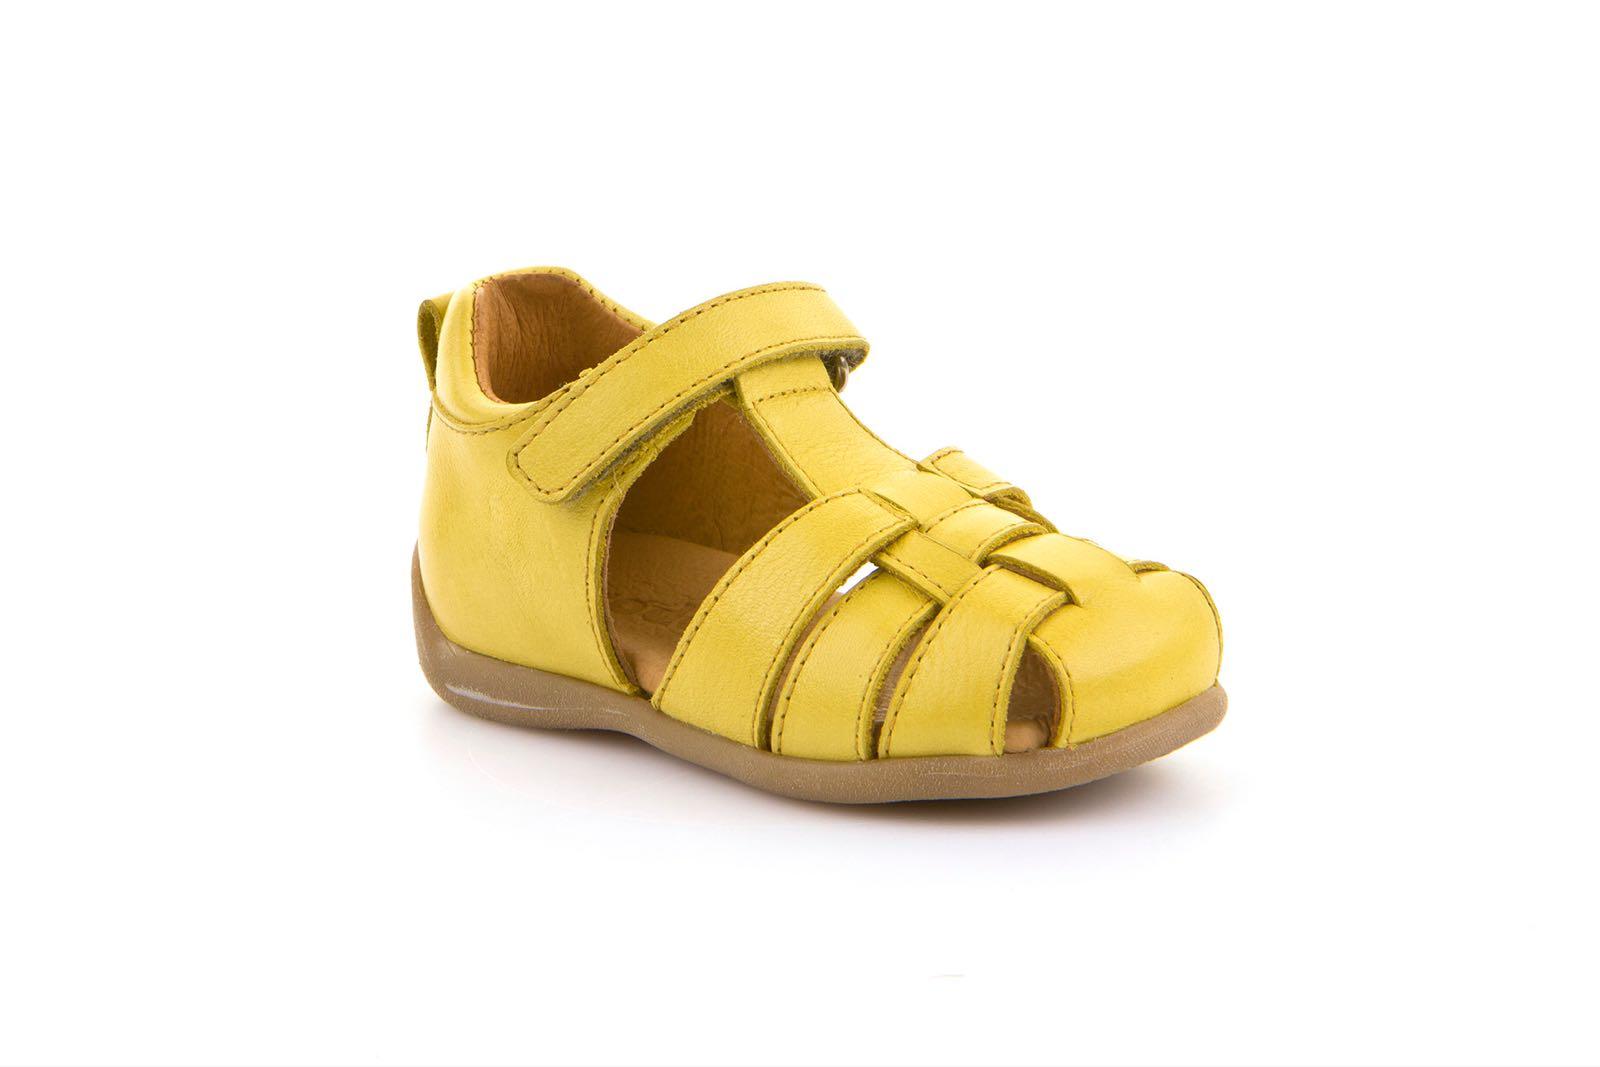 Froddo Yellow Sandal, G2150093-6